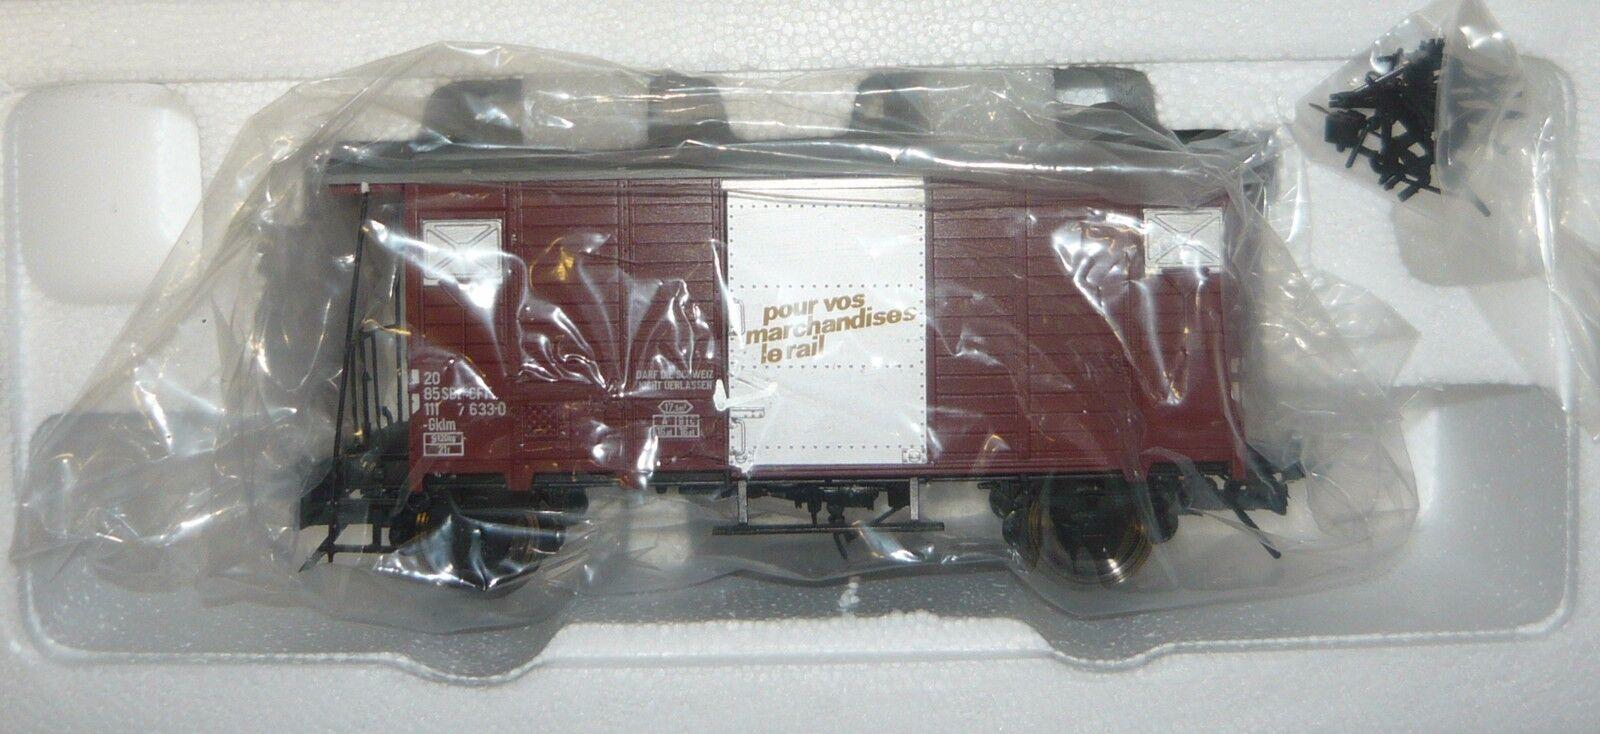 MTH Electric Trains 20-99016-0, con cena de vagones, SBB carril 0, neu&ovp